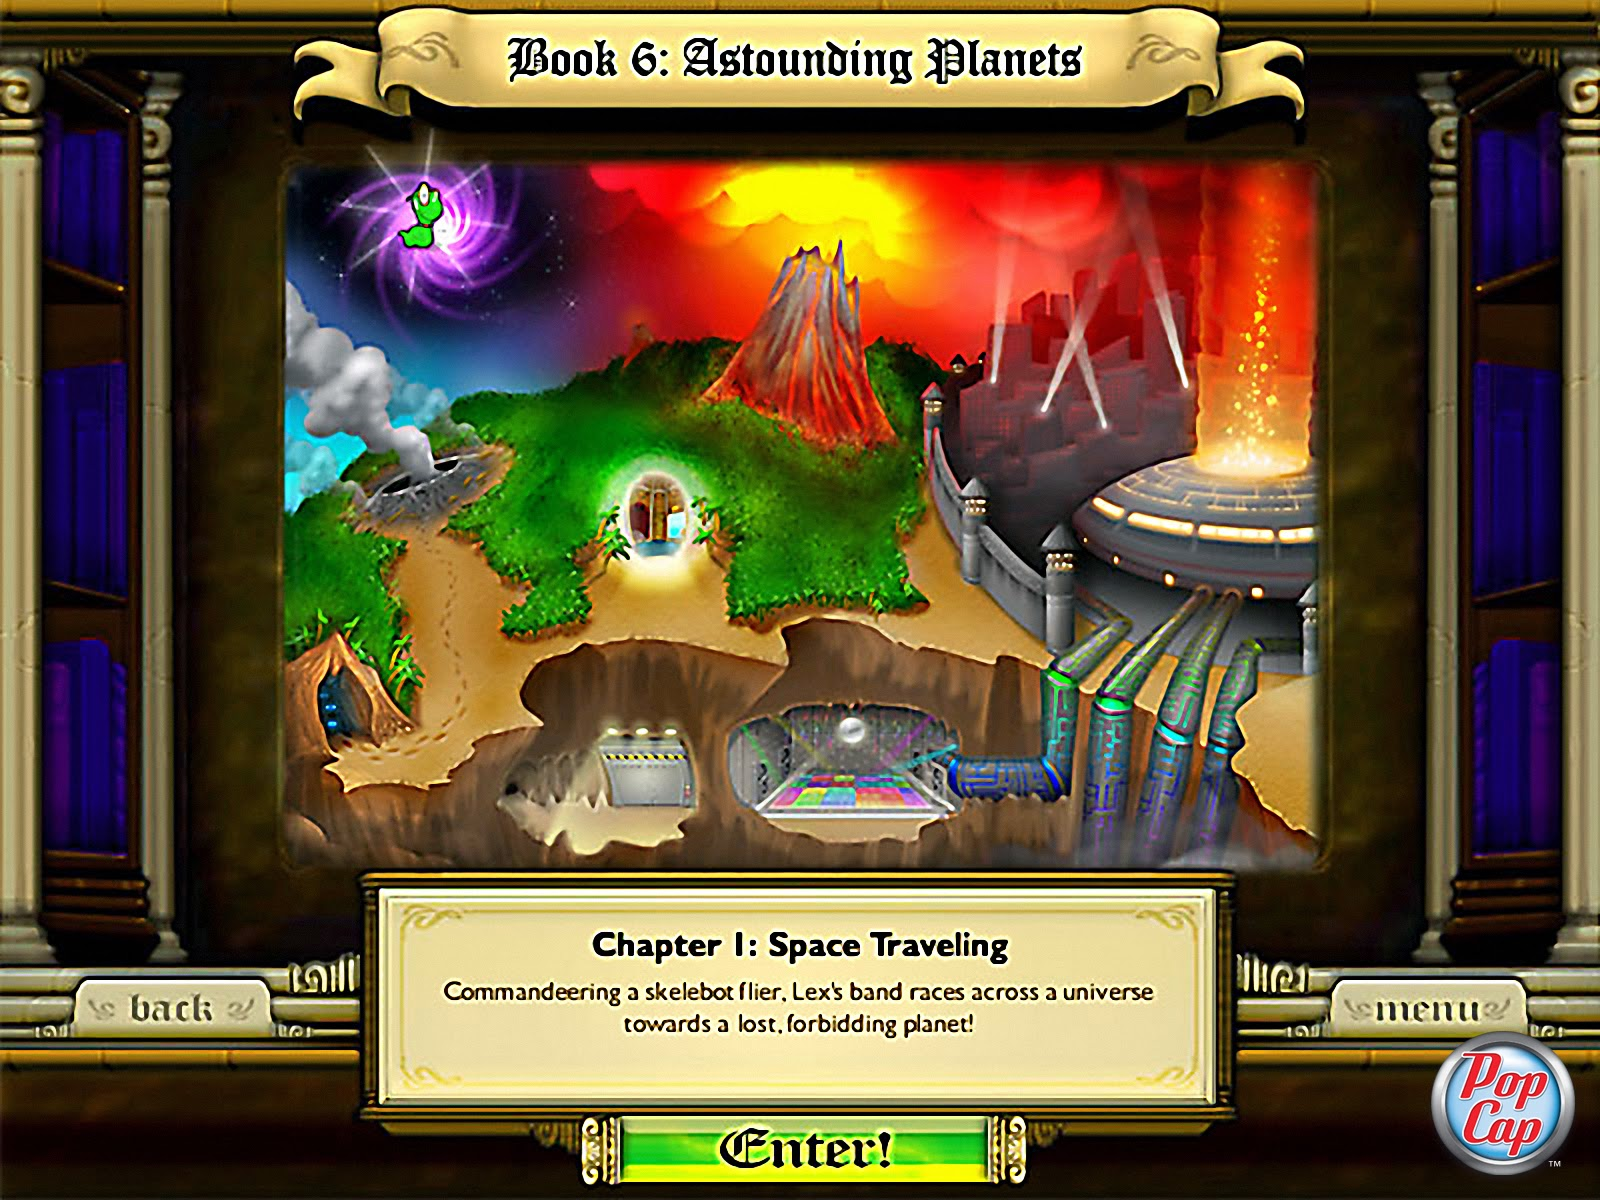 bookworm adventures 2 full version free download no trial